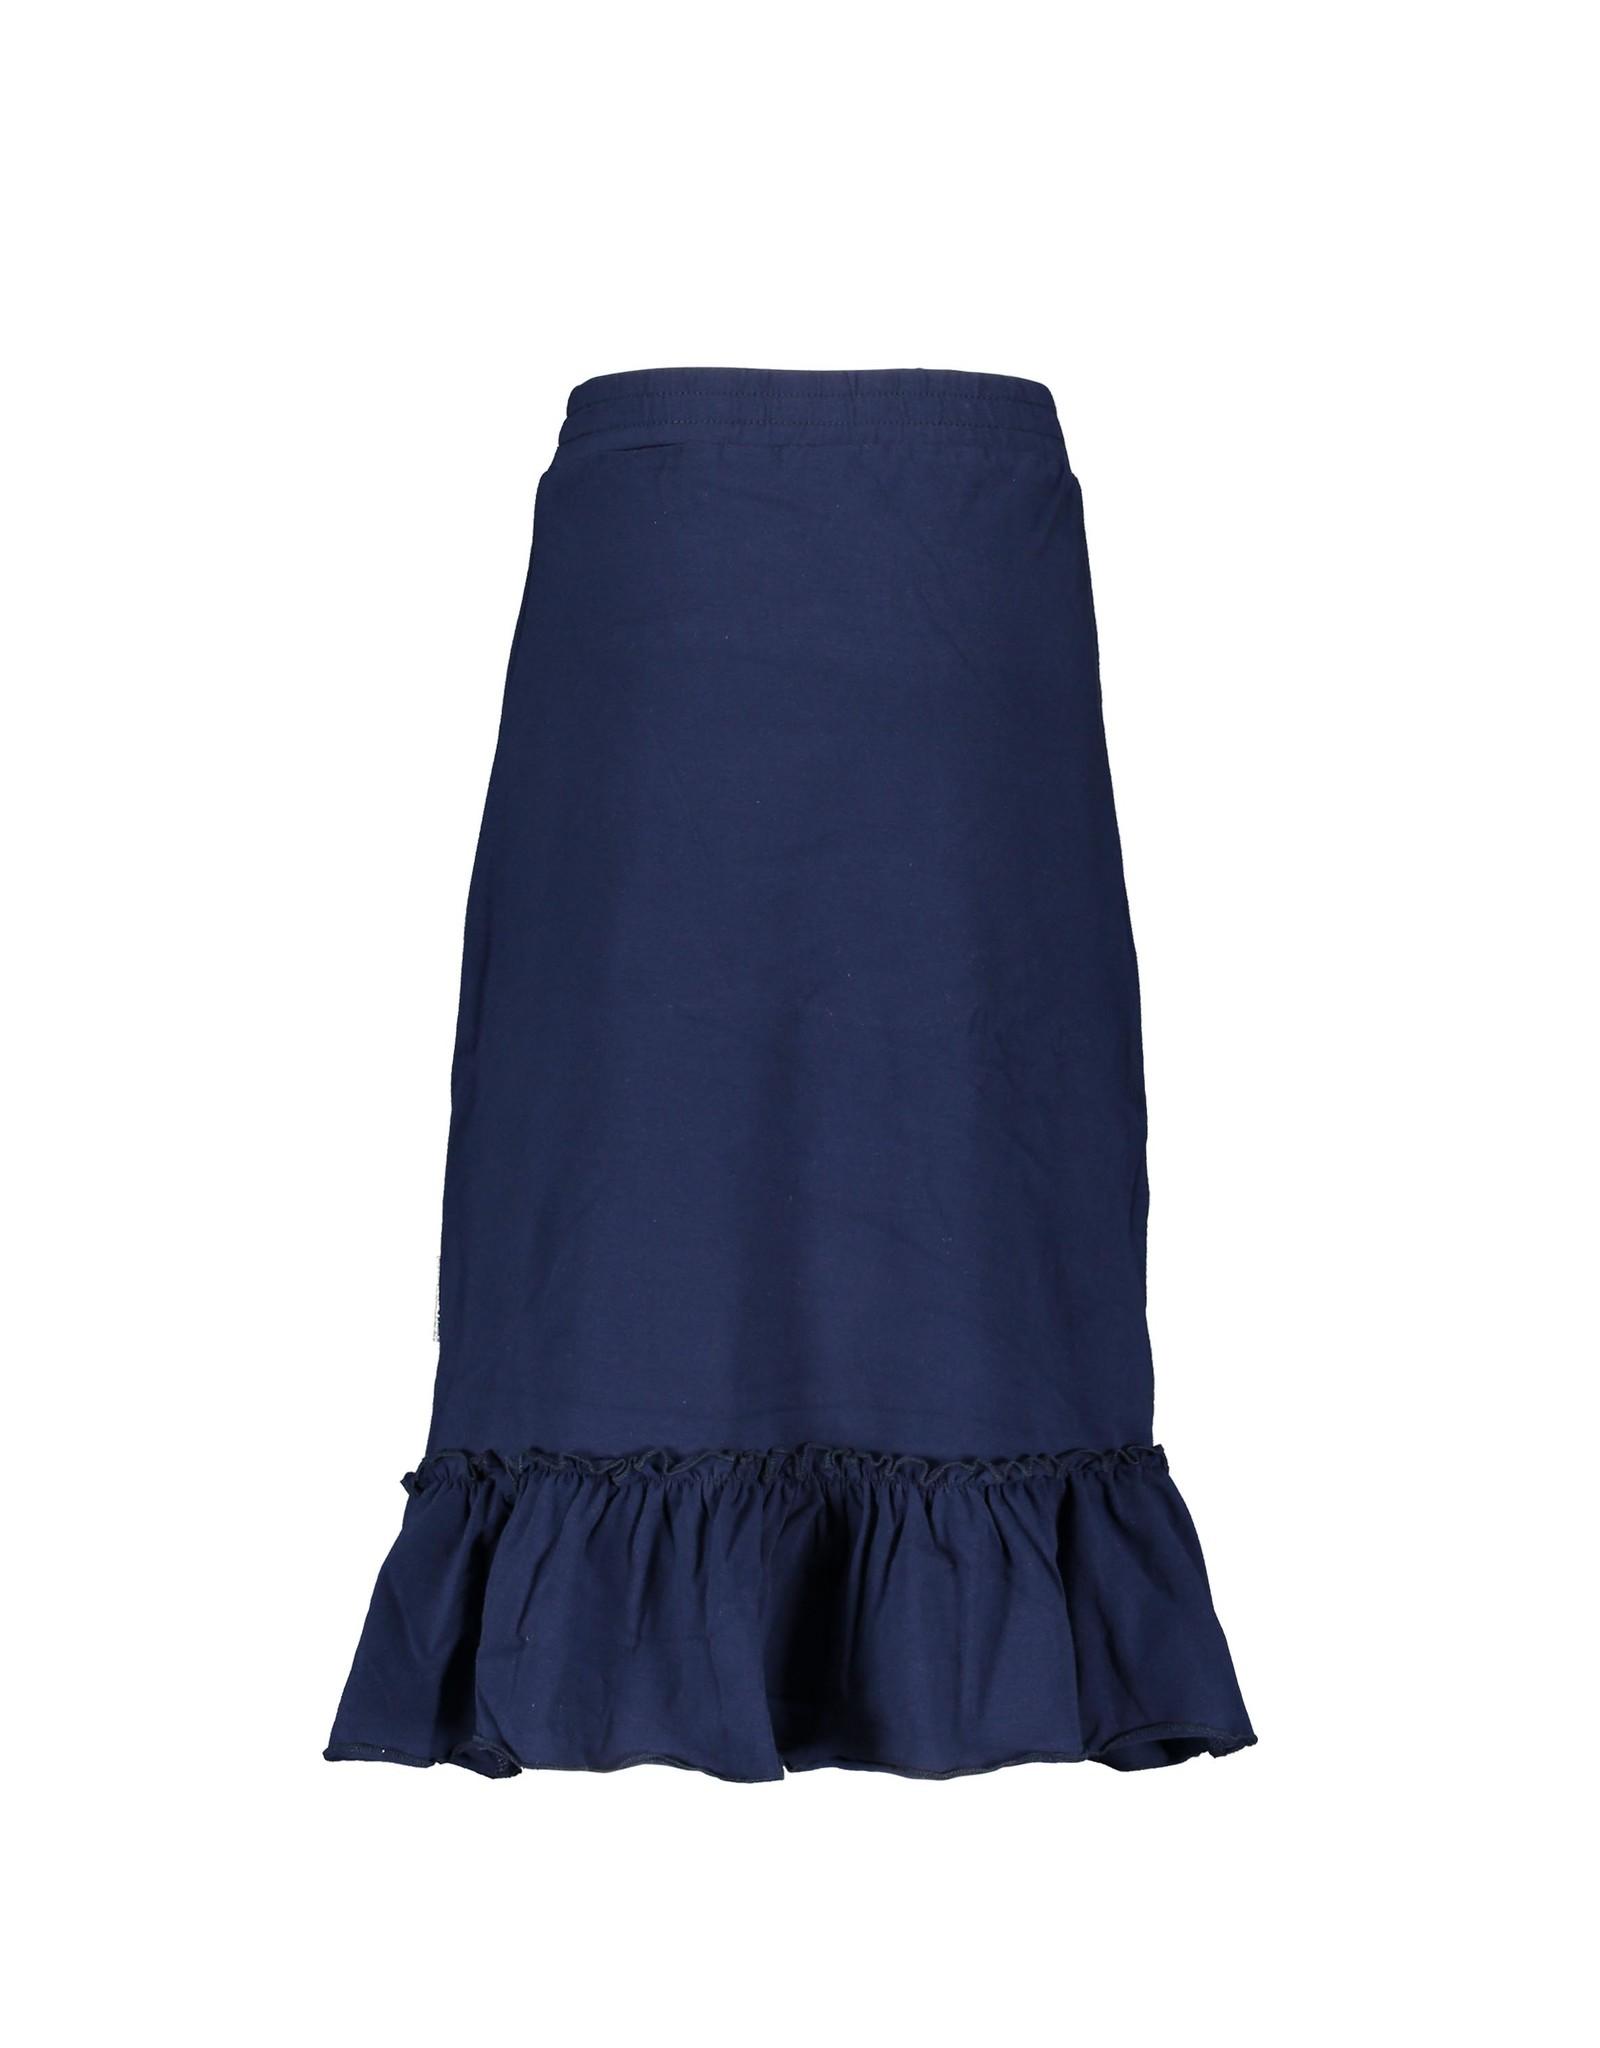 B-Nosy Girls enklebone length, space blue